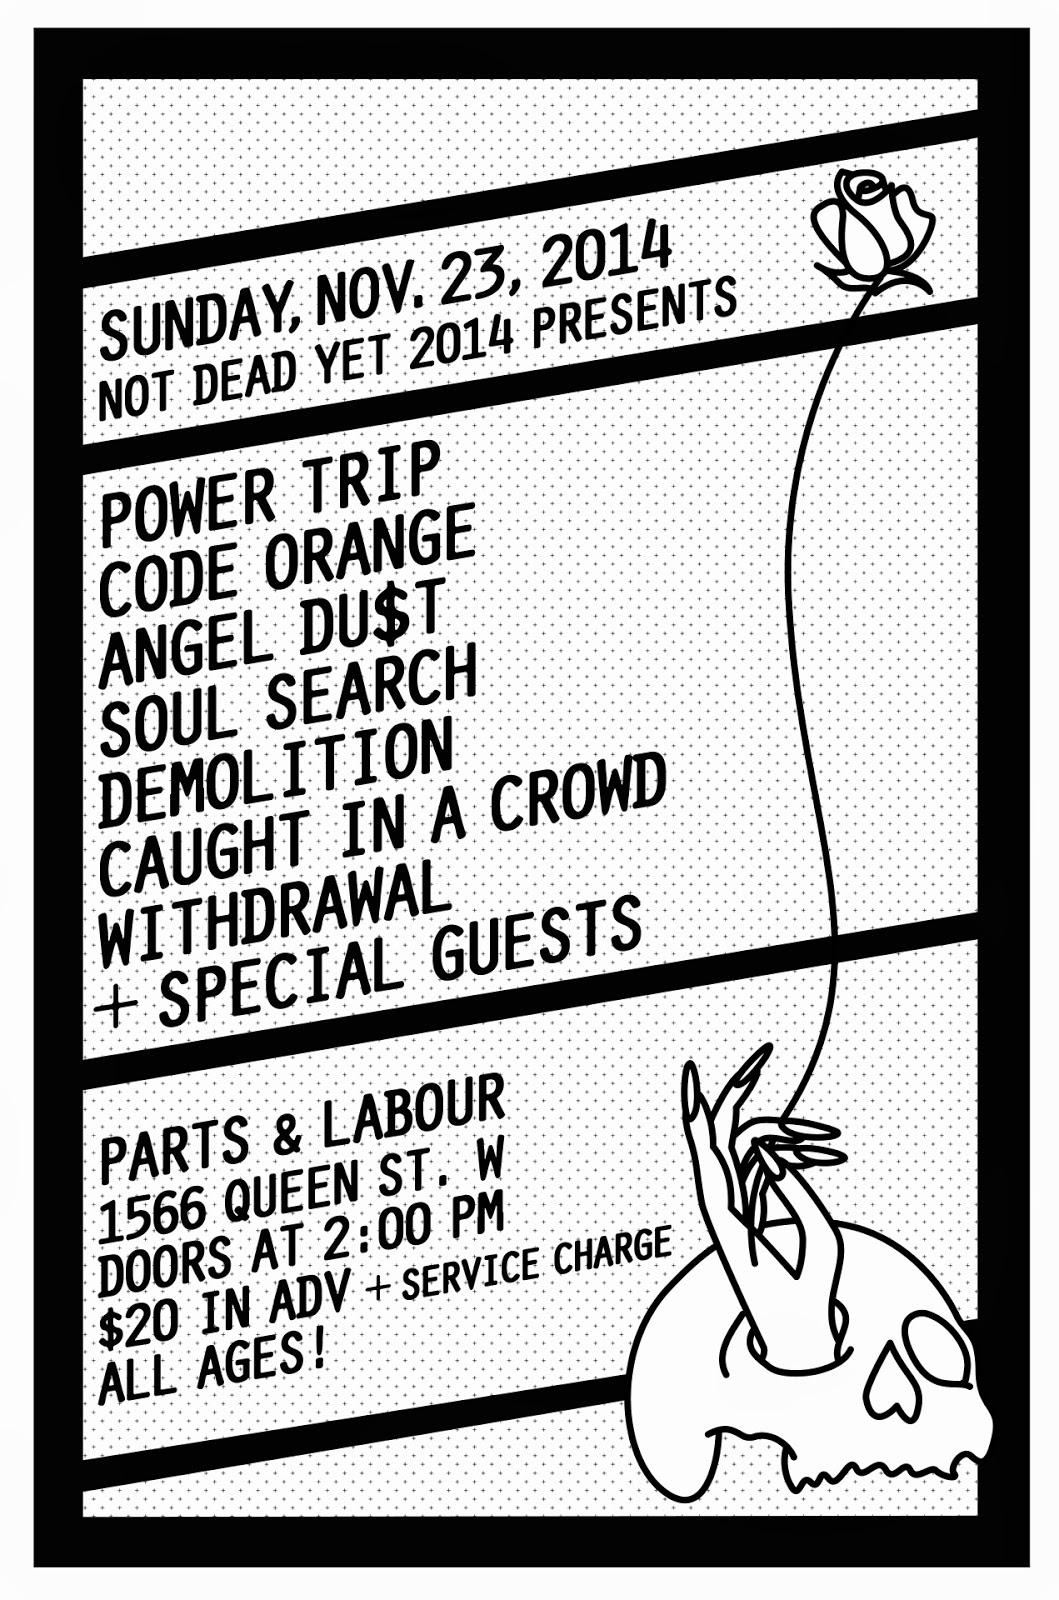 Flyer sunday november 23rd 2014